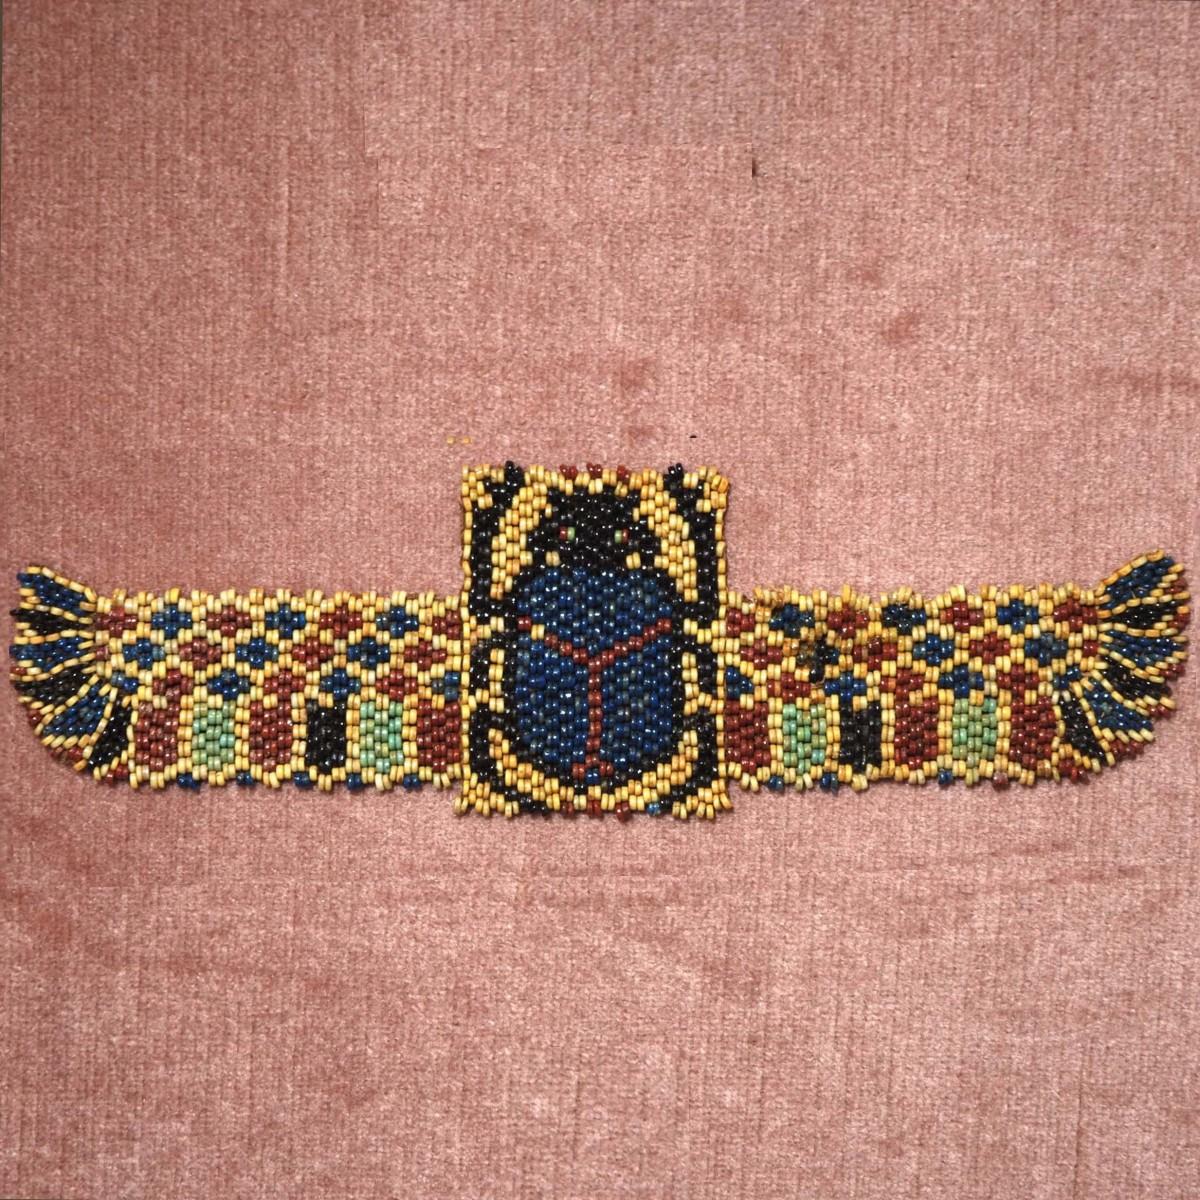 Egyptian funerary bead scarab